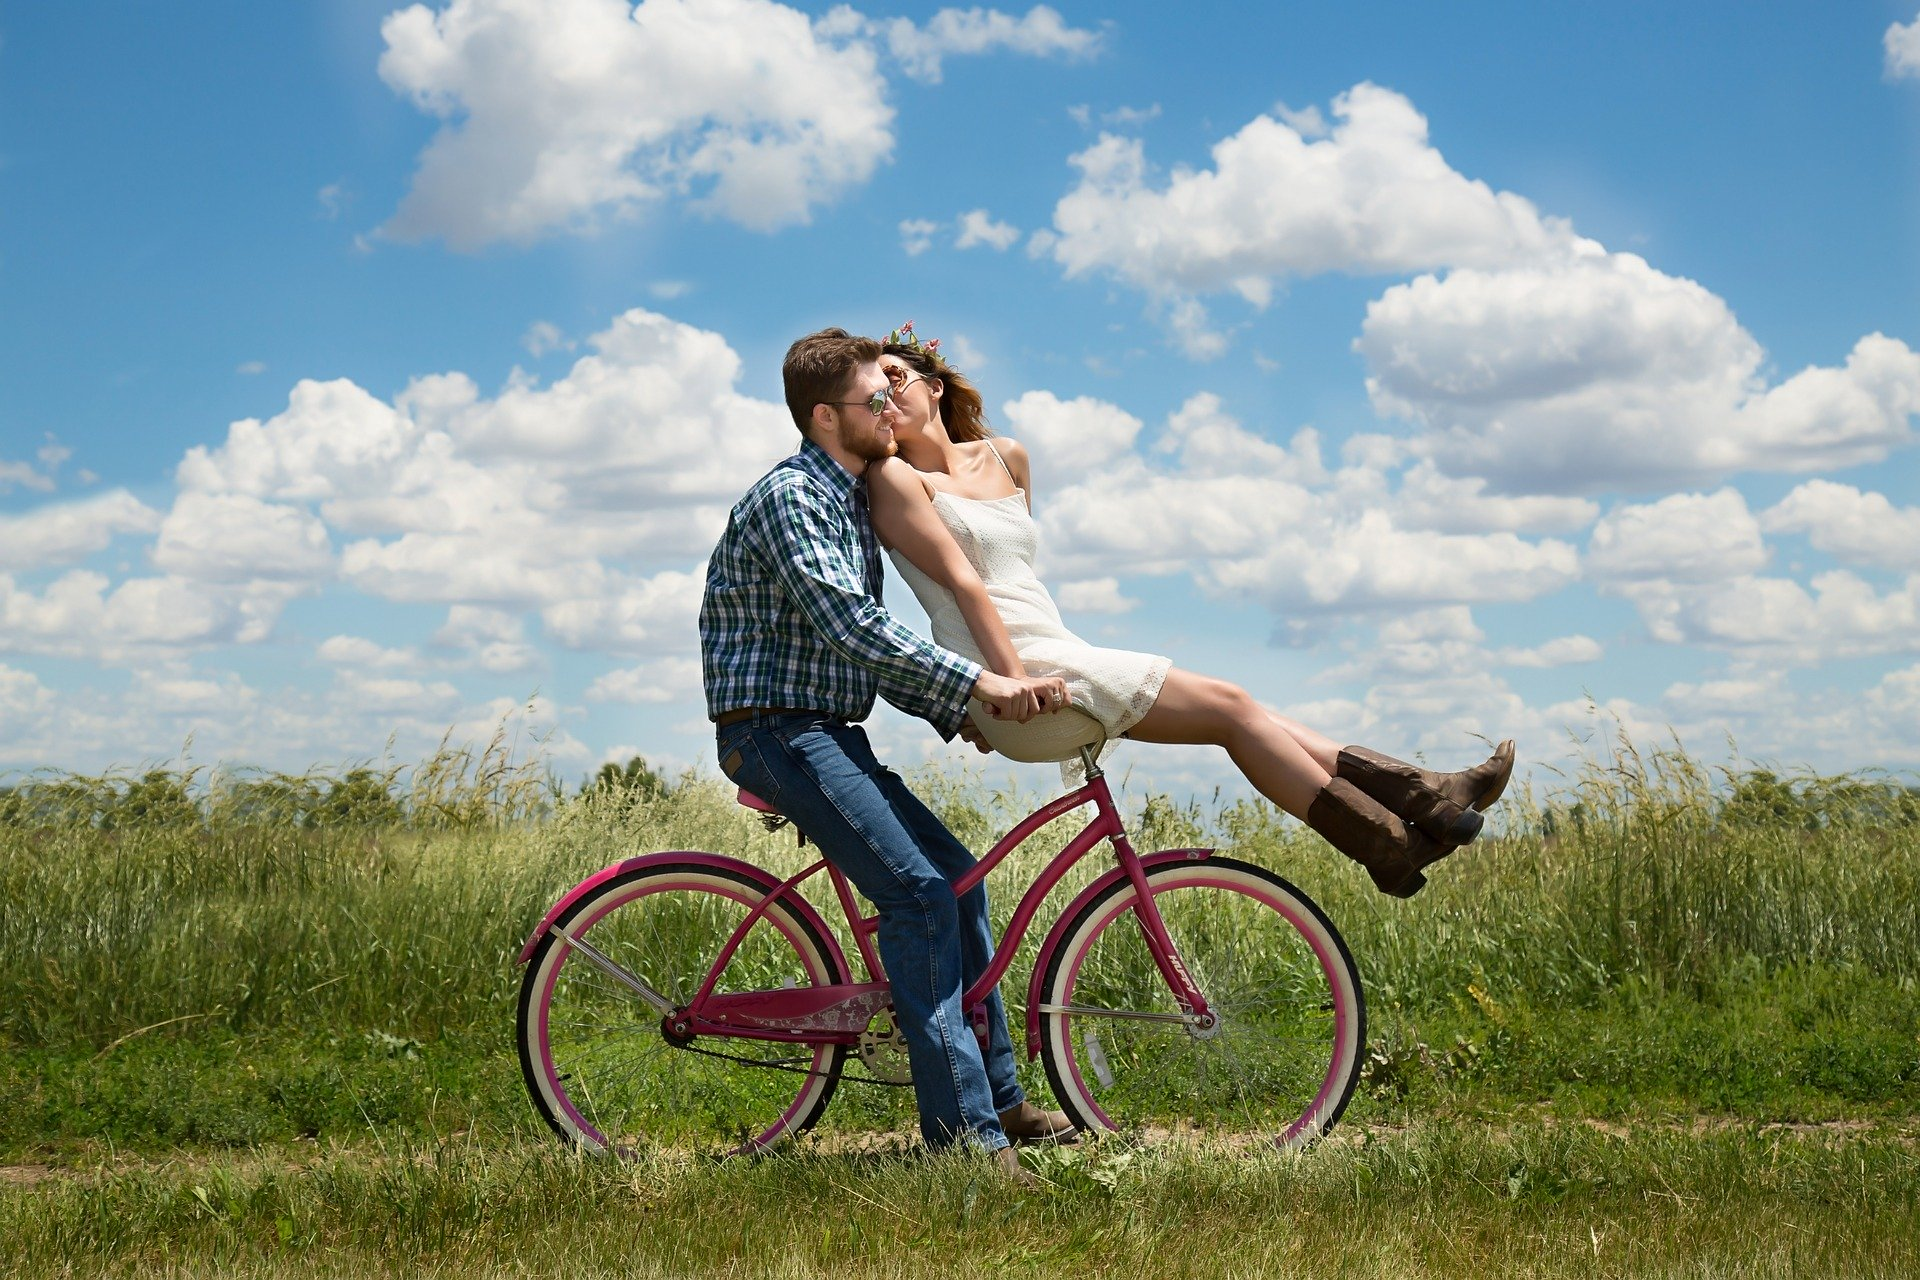 Fahrrad online shop Fahrräder E-bikes bestellen